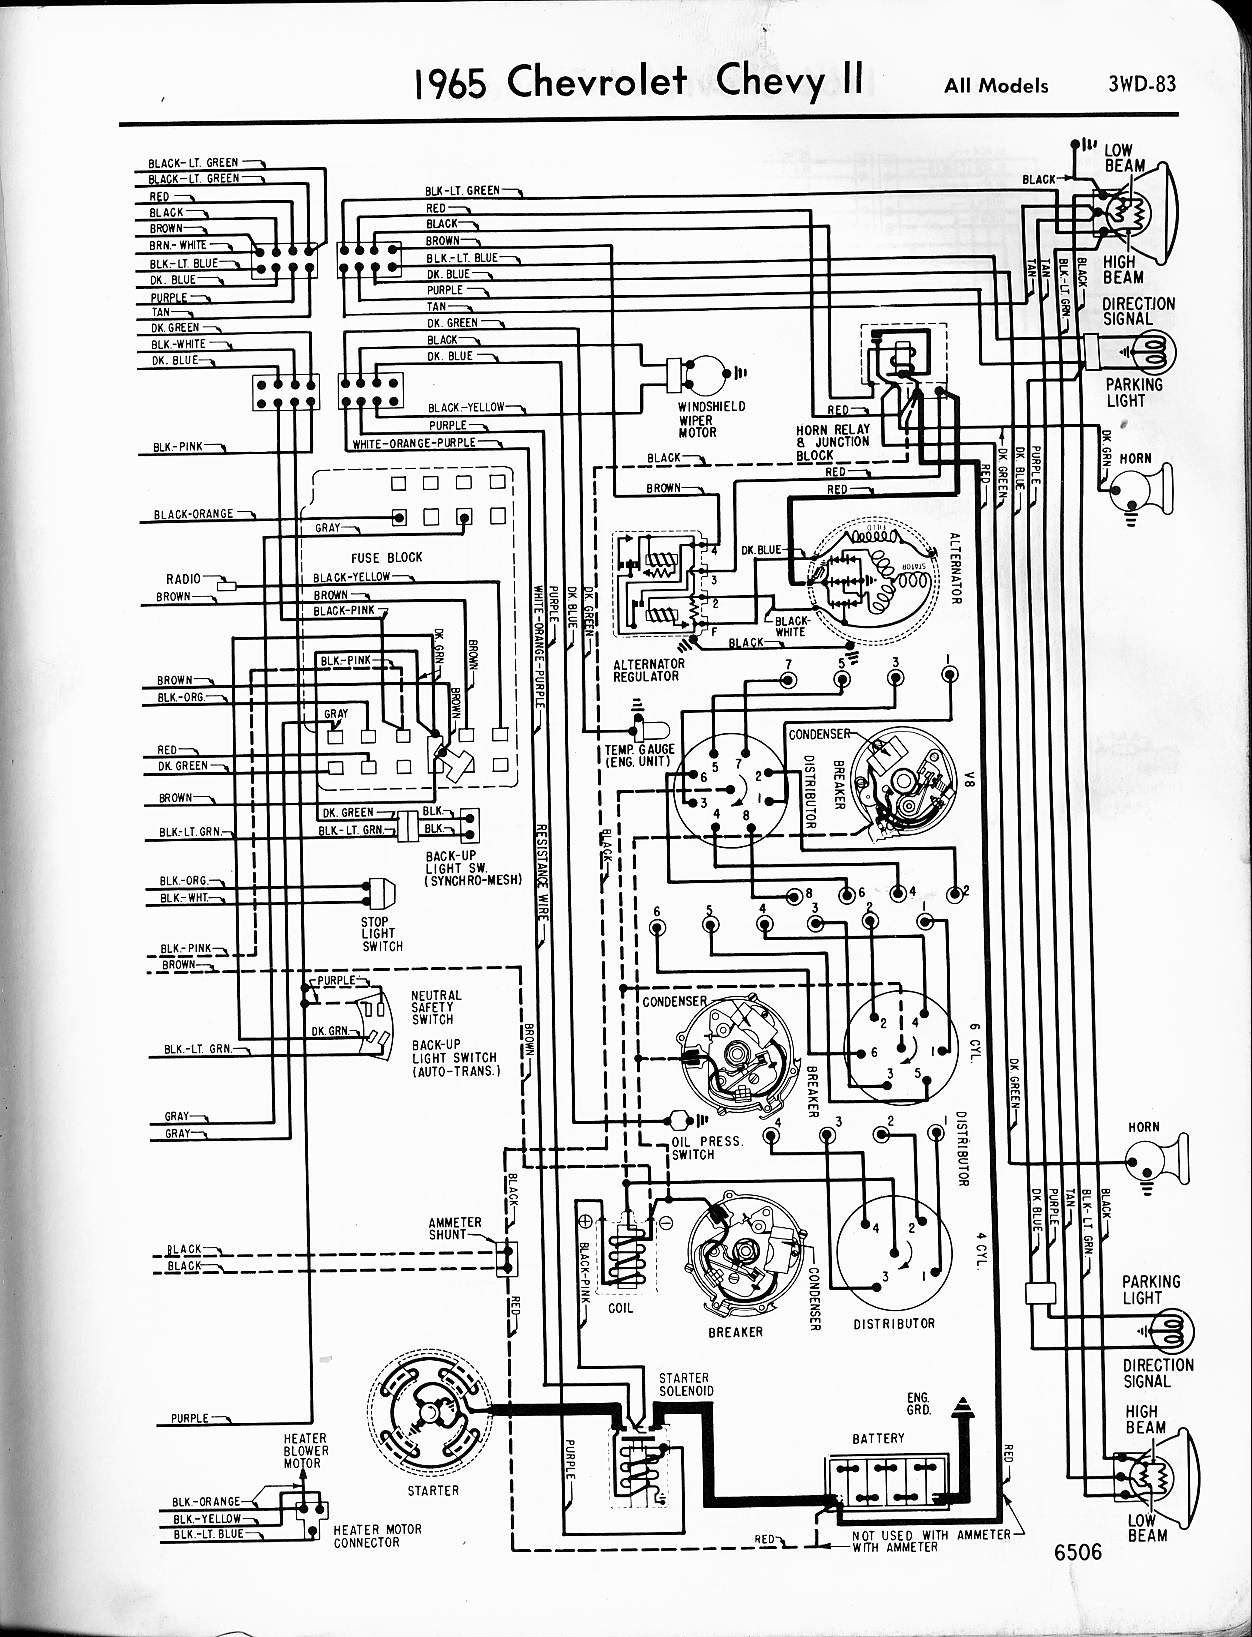 1970 Lincoln Continental Wiring Diagram Block Diagram 2 Inputs Ezgobattery Cukk Jeanjaures37 Fr